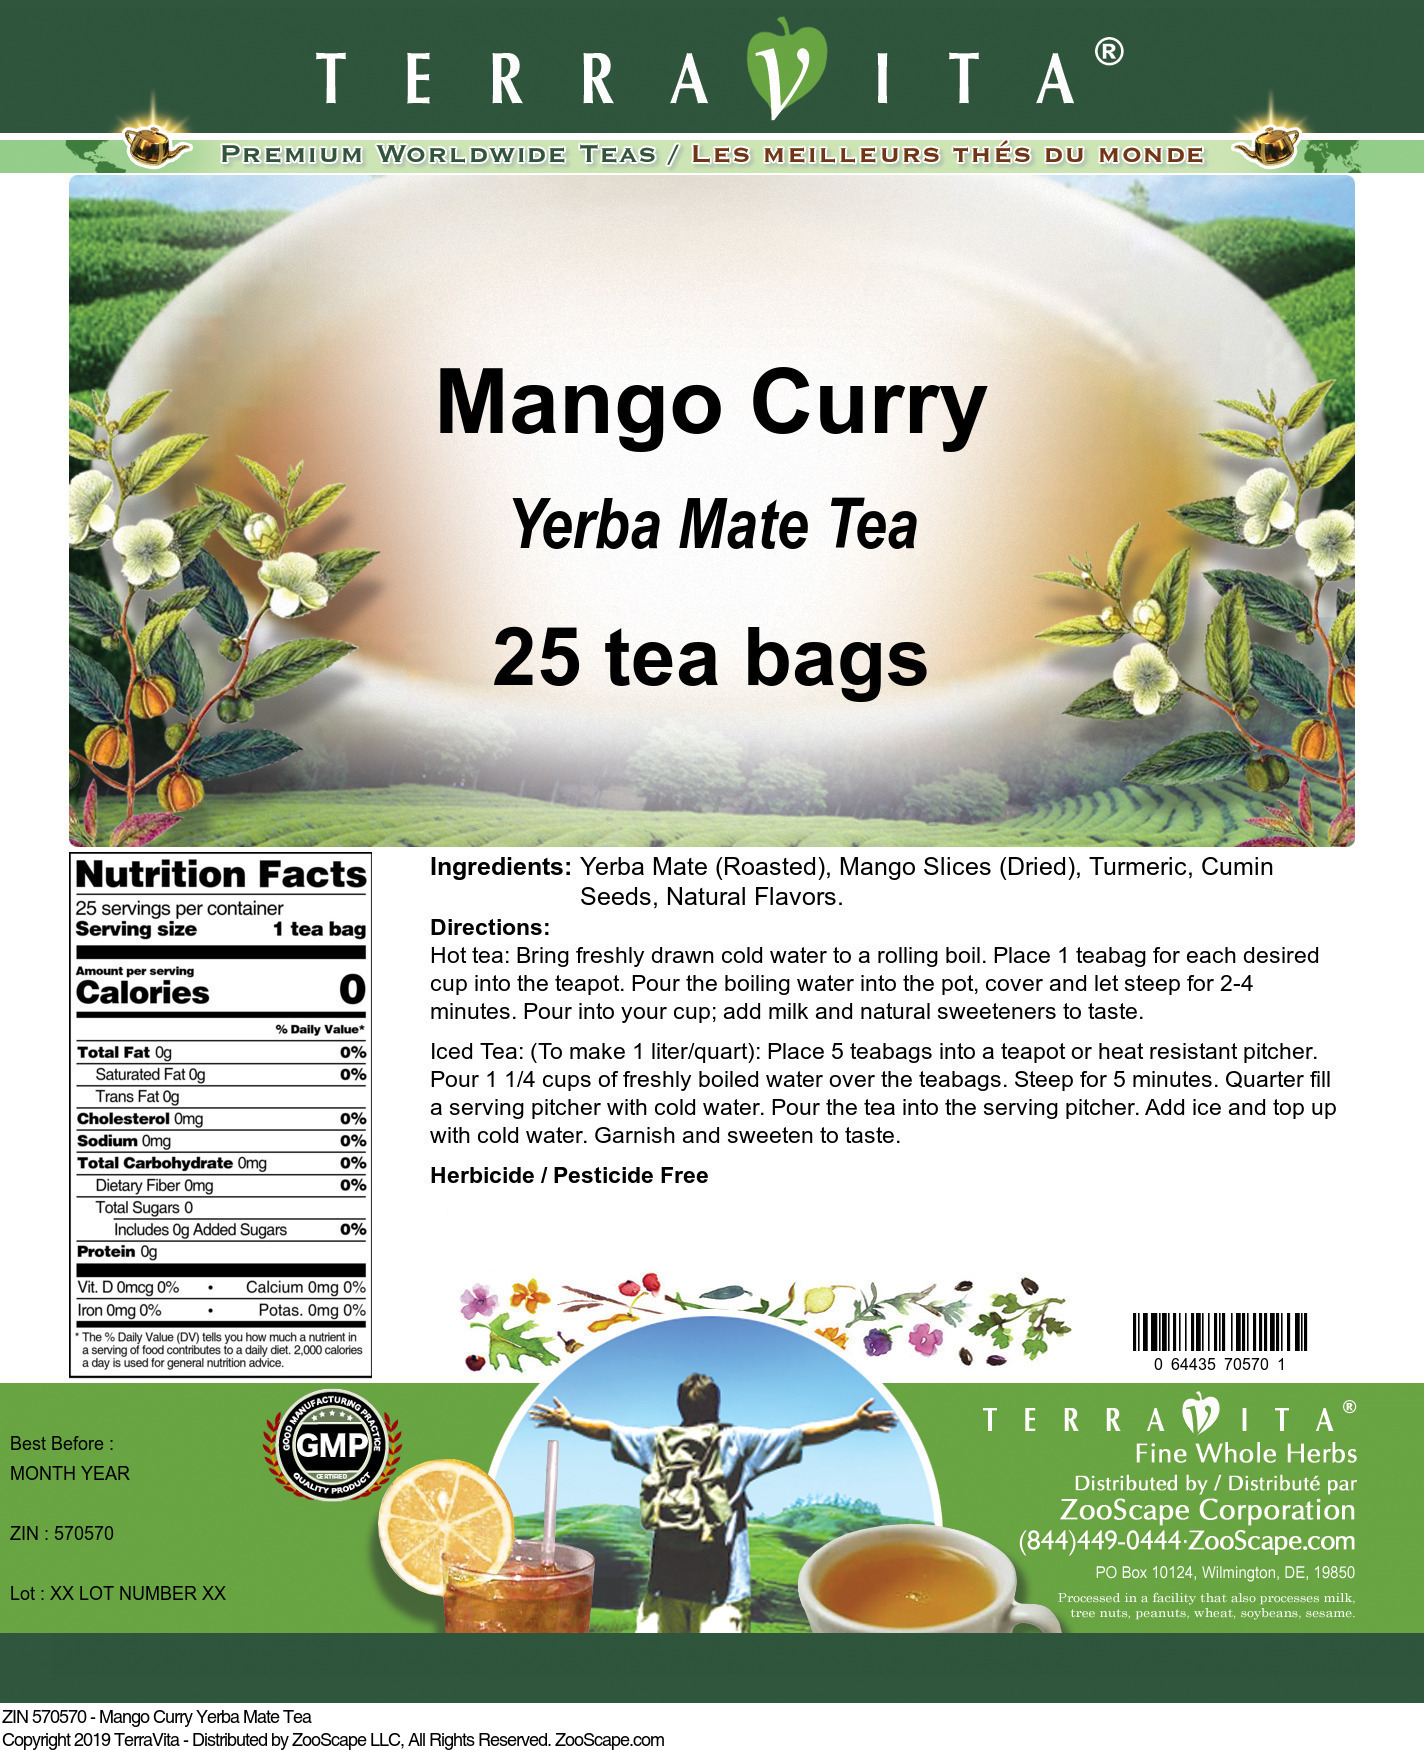 Mango Curry Yerba Mate